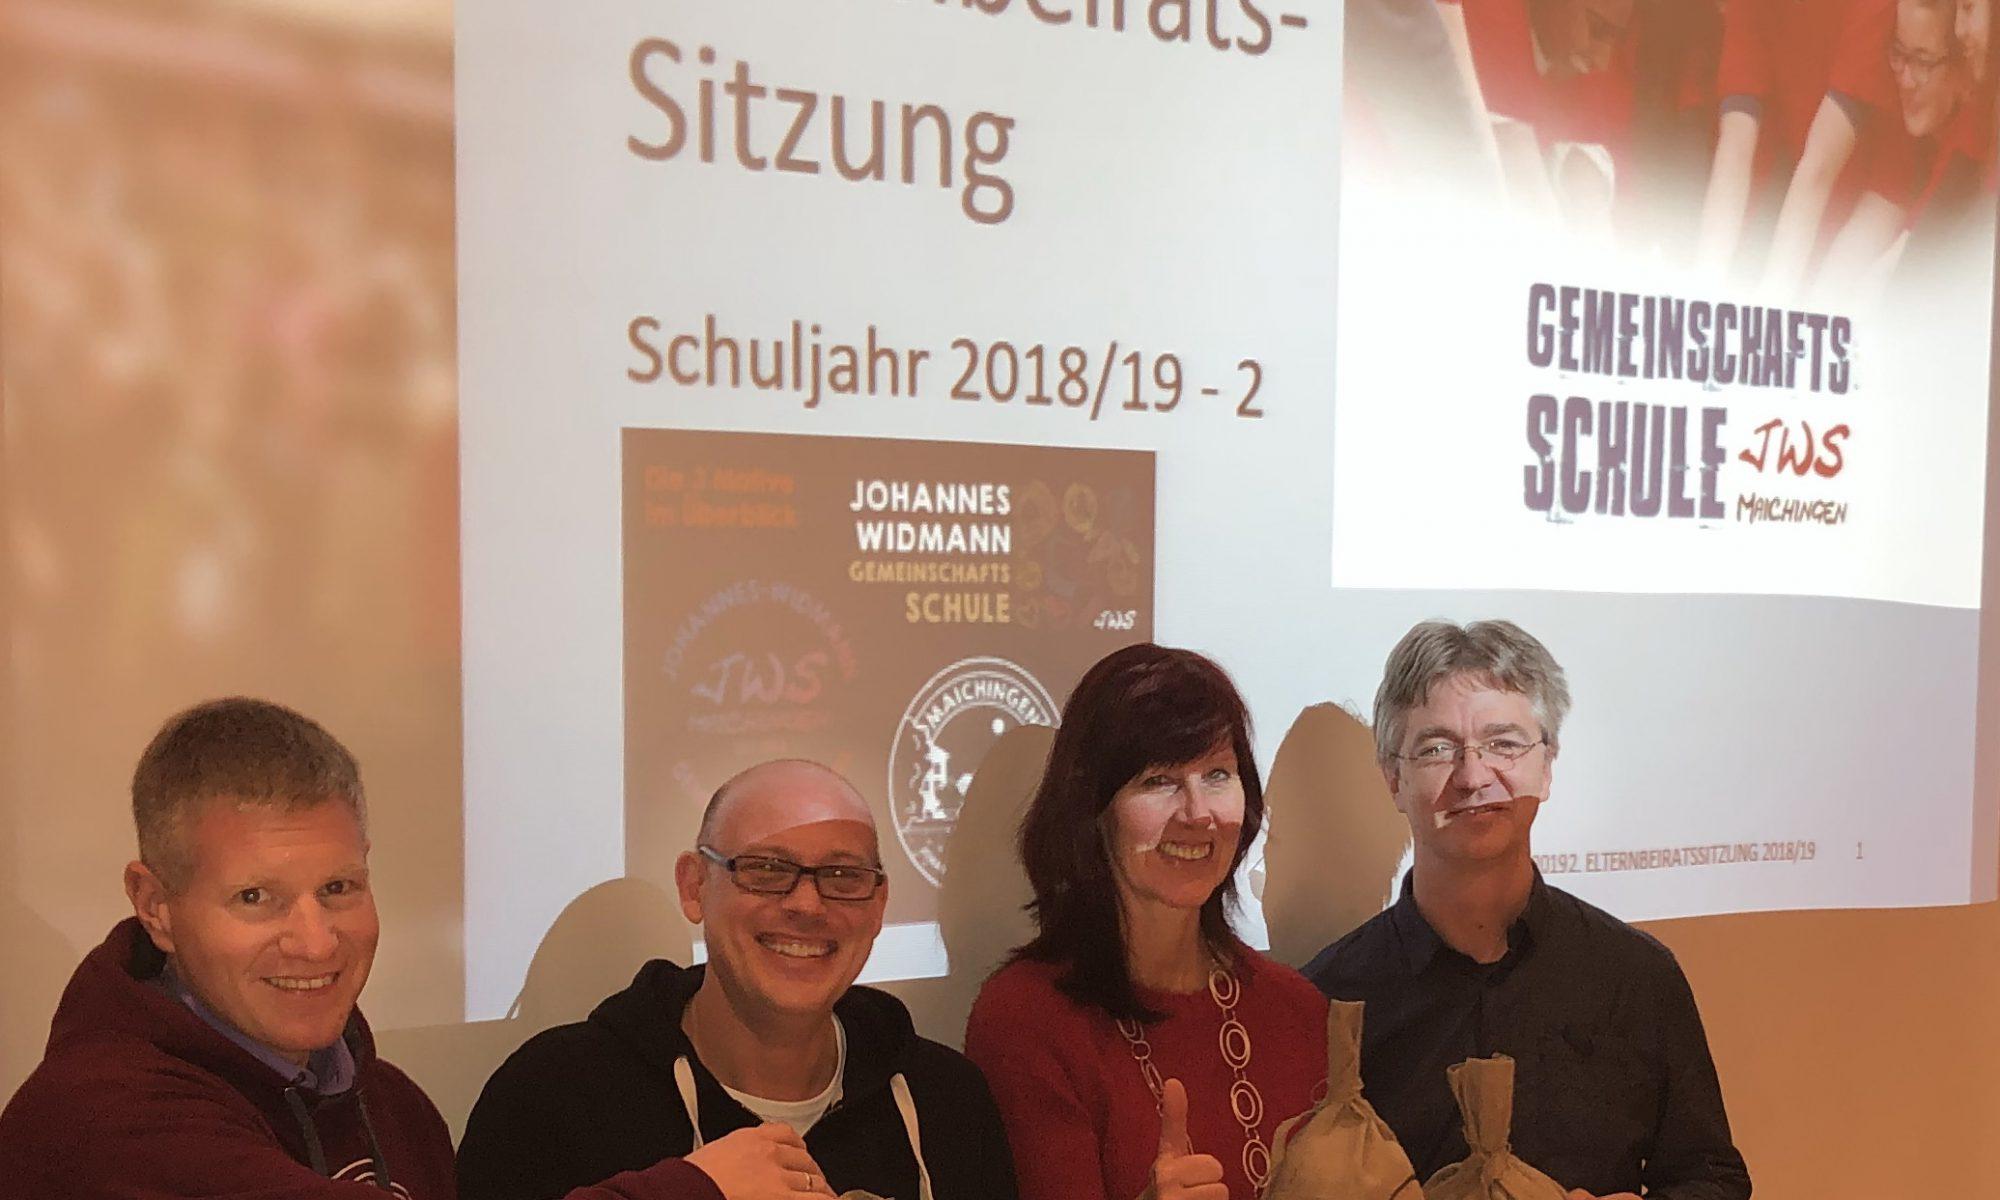 "Spende an Förderverein ""Schule Aktiv"" der Johannes-Widmann-Schule Maichingen (18.03.2019). (v.l.n.r.: Ulrich Martens, Alexander Döttling, Konrektorin Sabine Lalla, Schulsozialarbeiter Thoralf Stöhrer)"